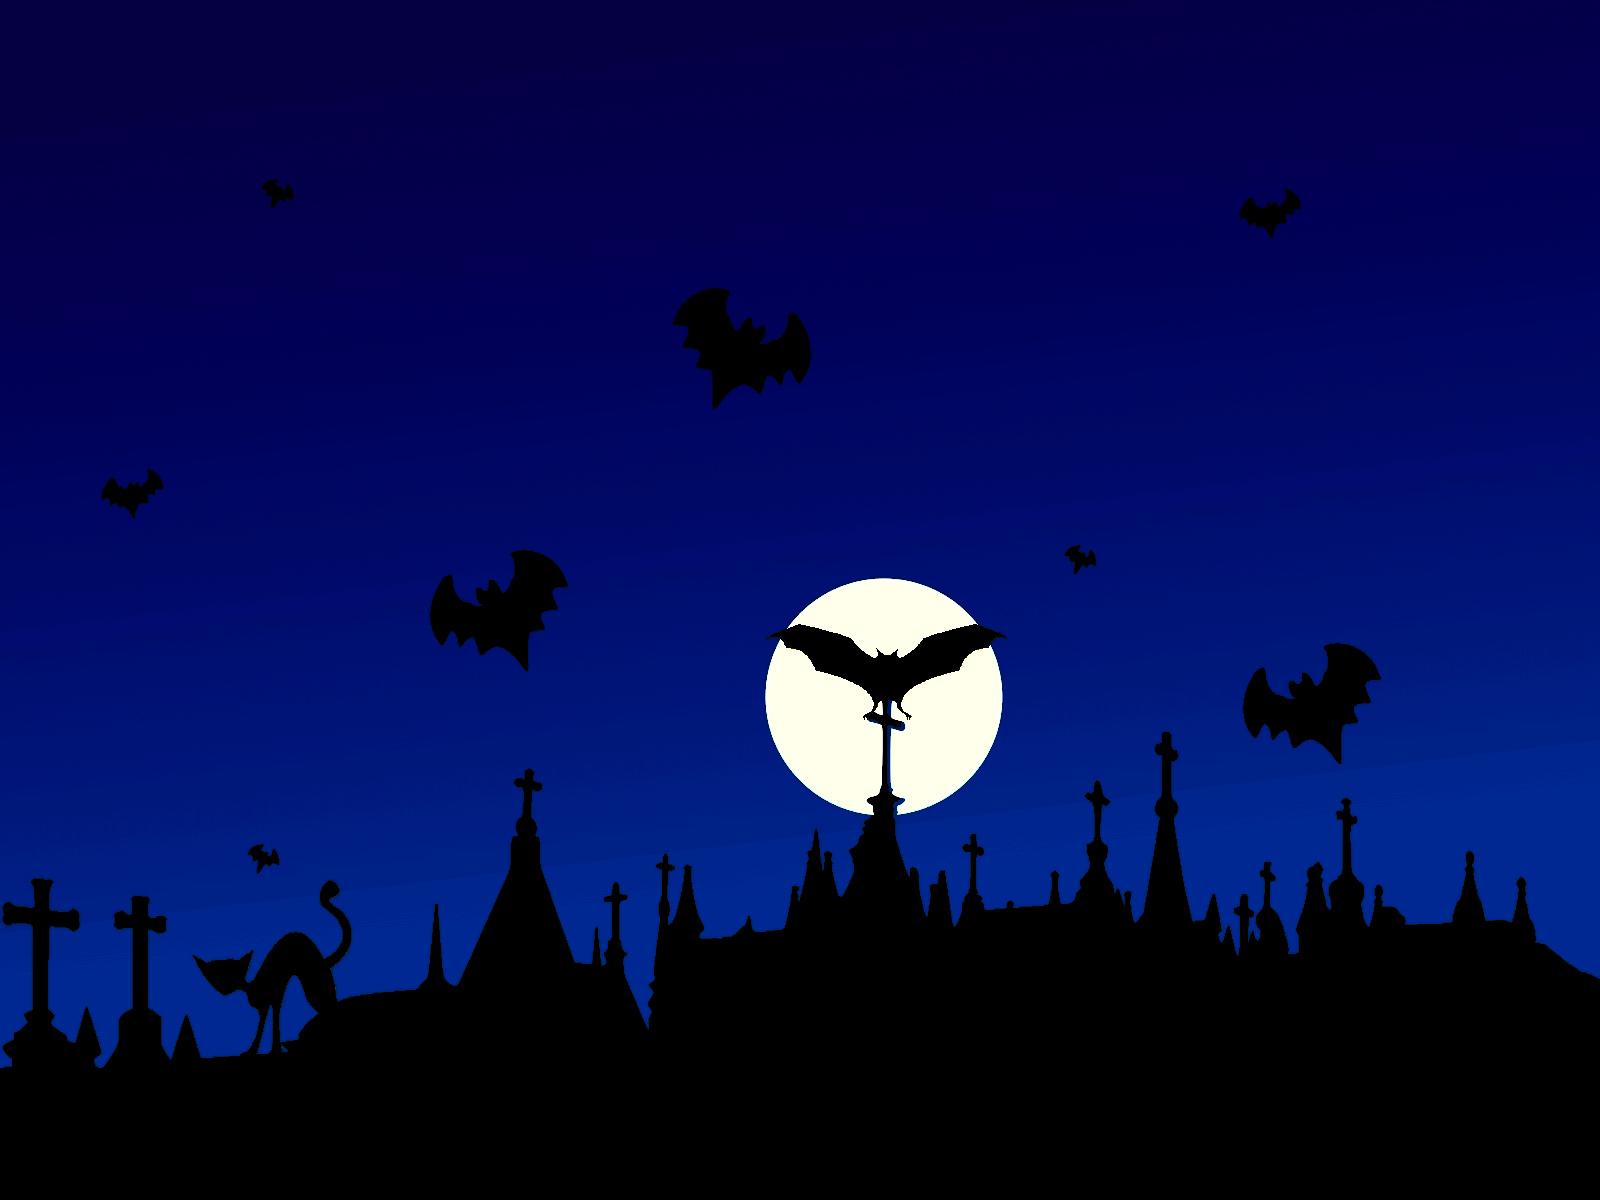 halloween moon wallpaper - photo #22